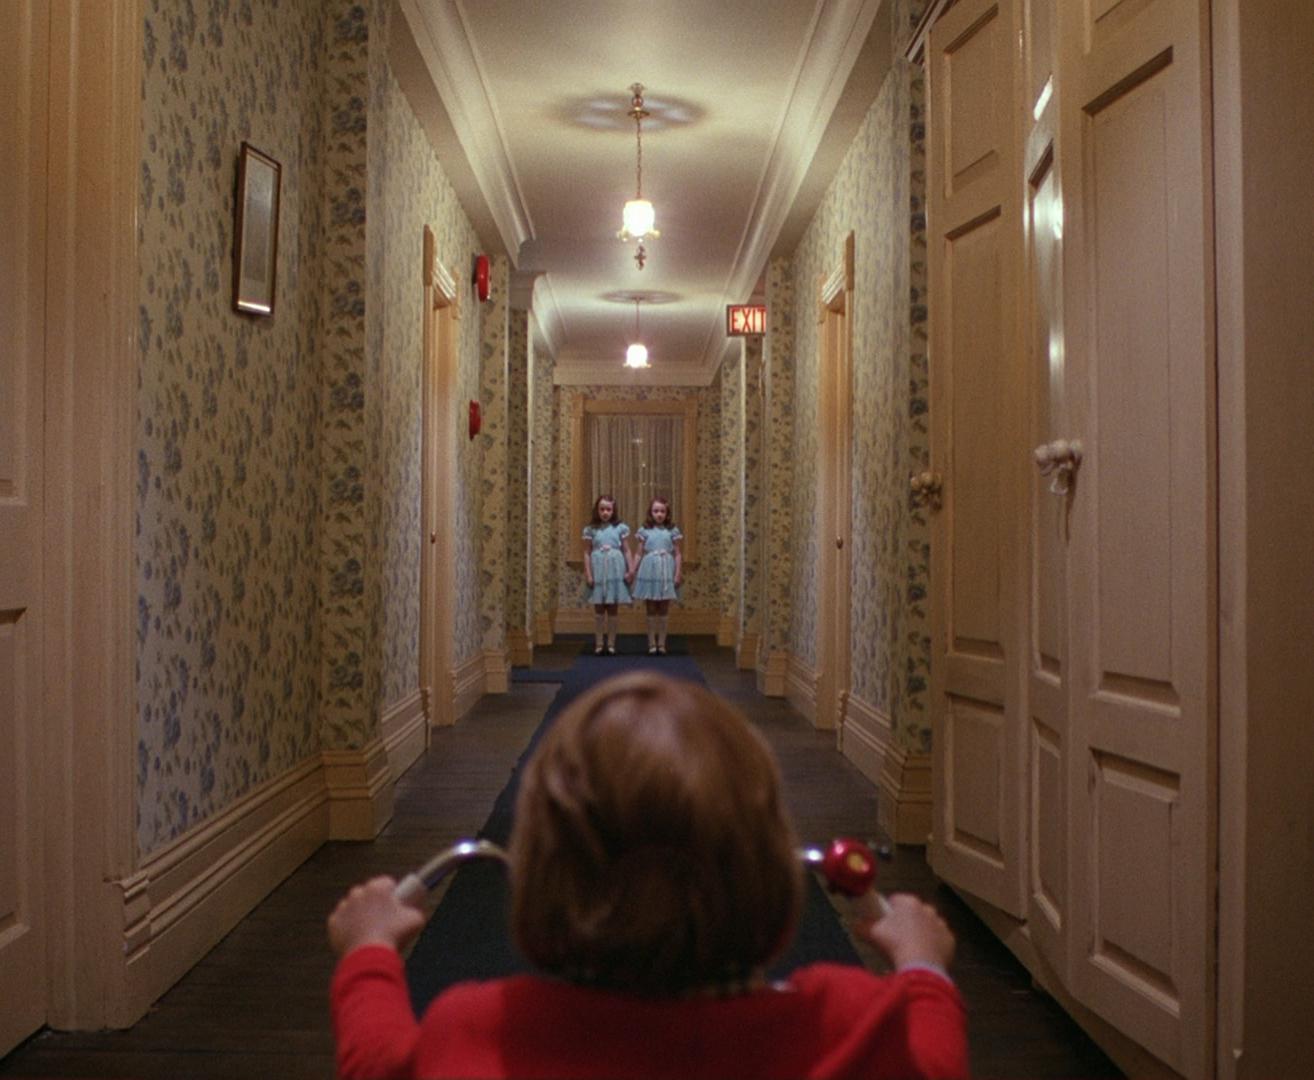 The Shining - 1980 - Stanley Kubrick